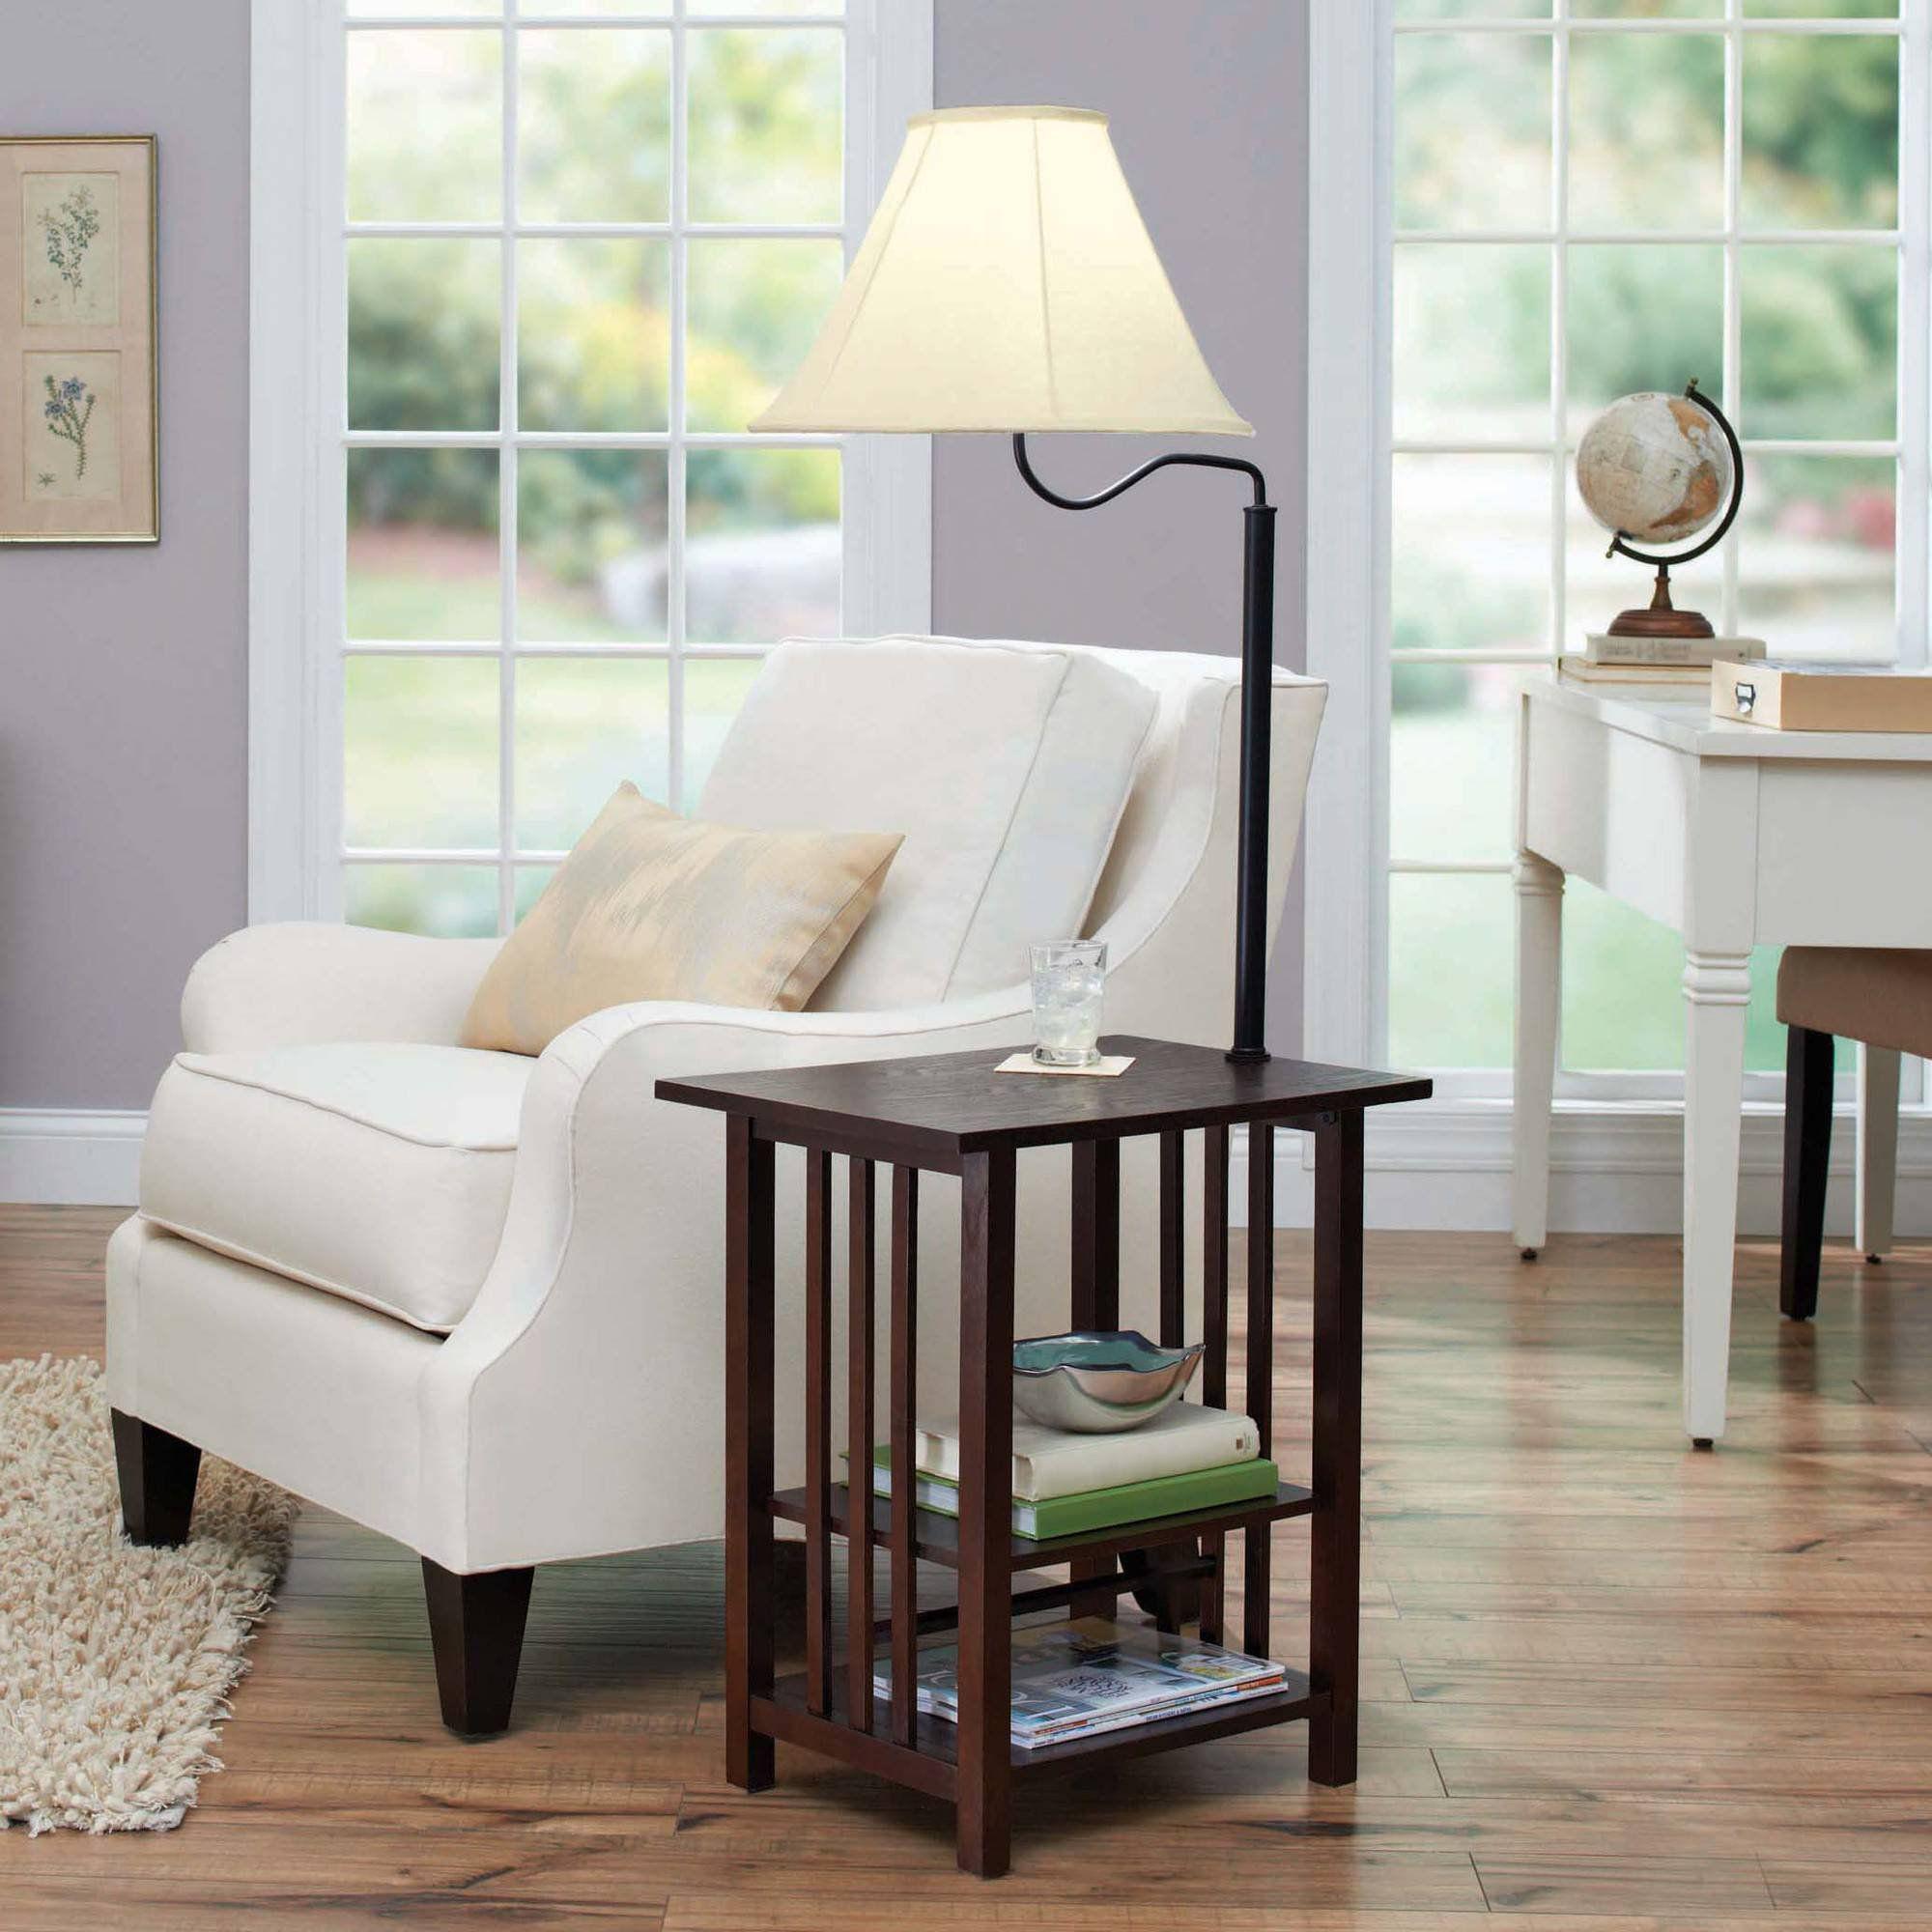 Better Homes & Gardens End Table Floor Lamp, Espresso